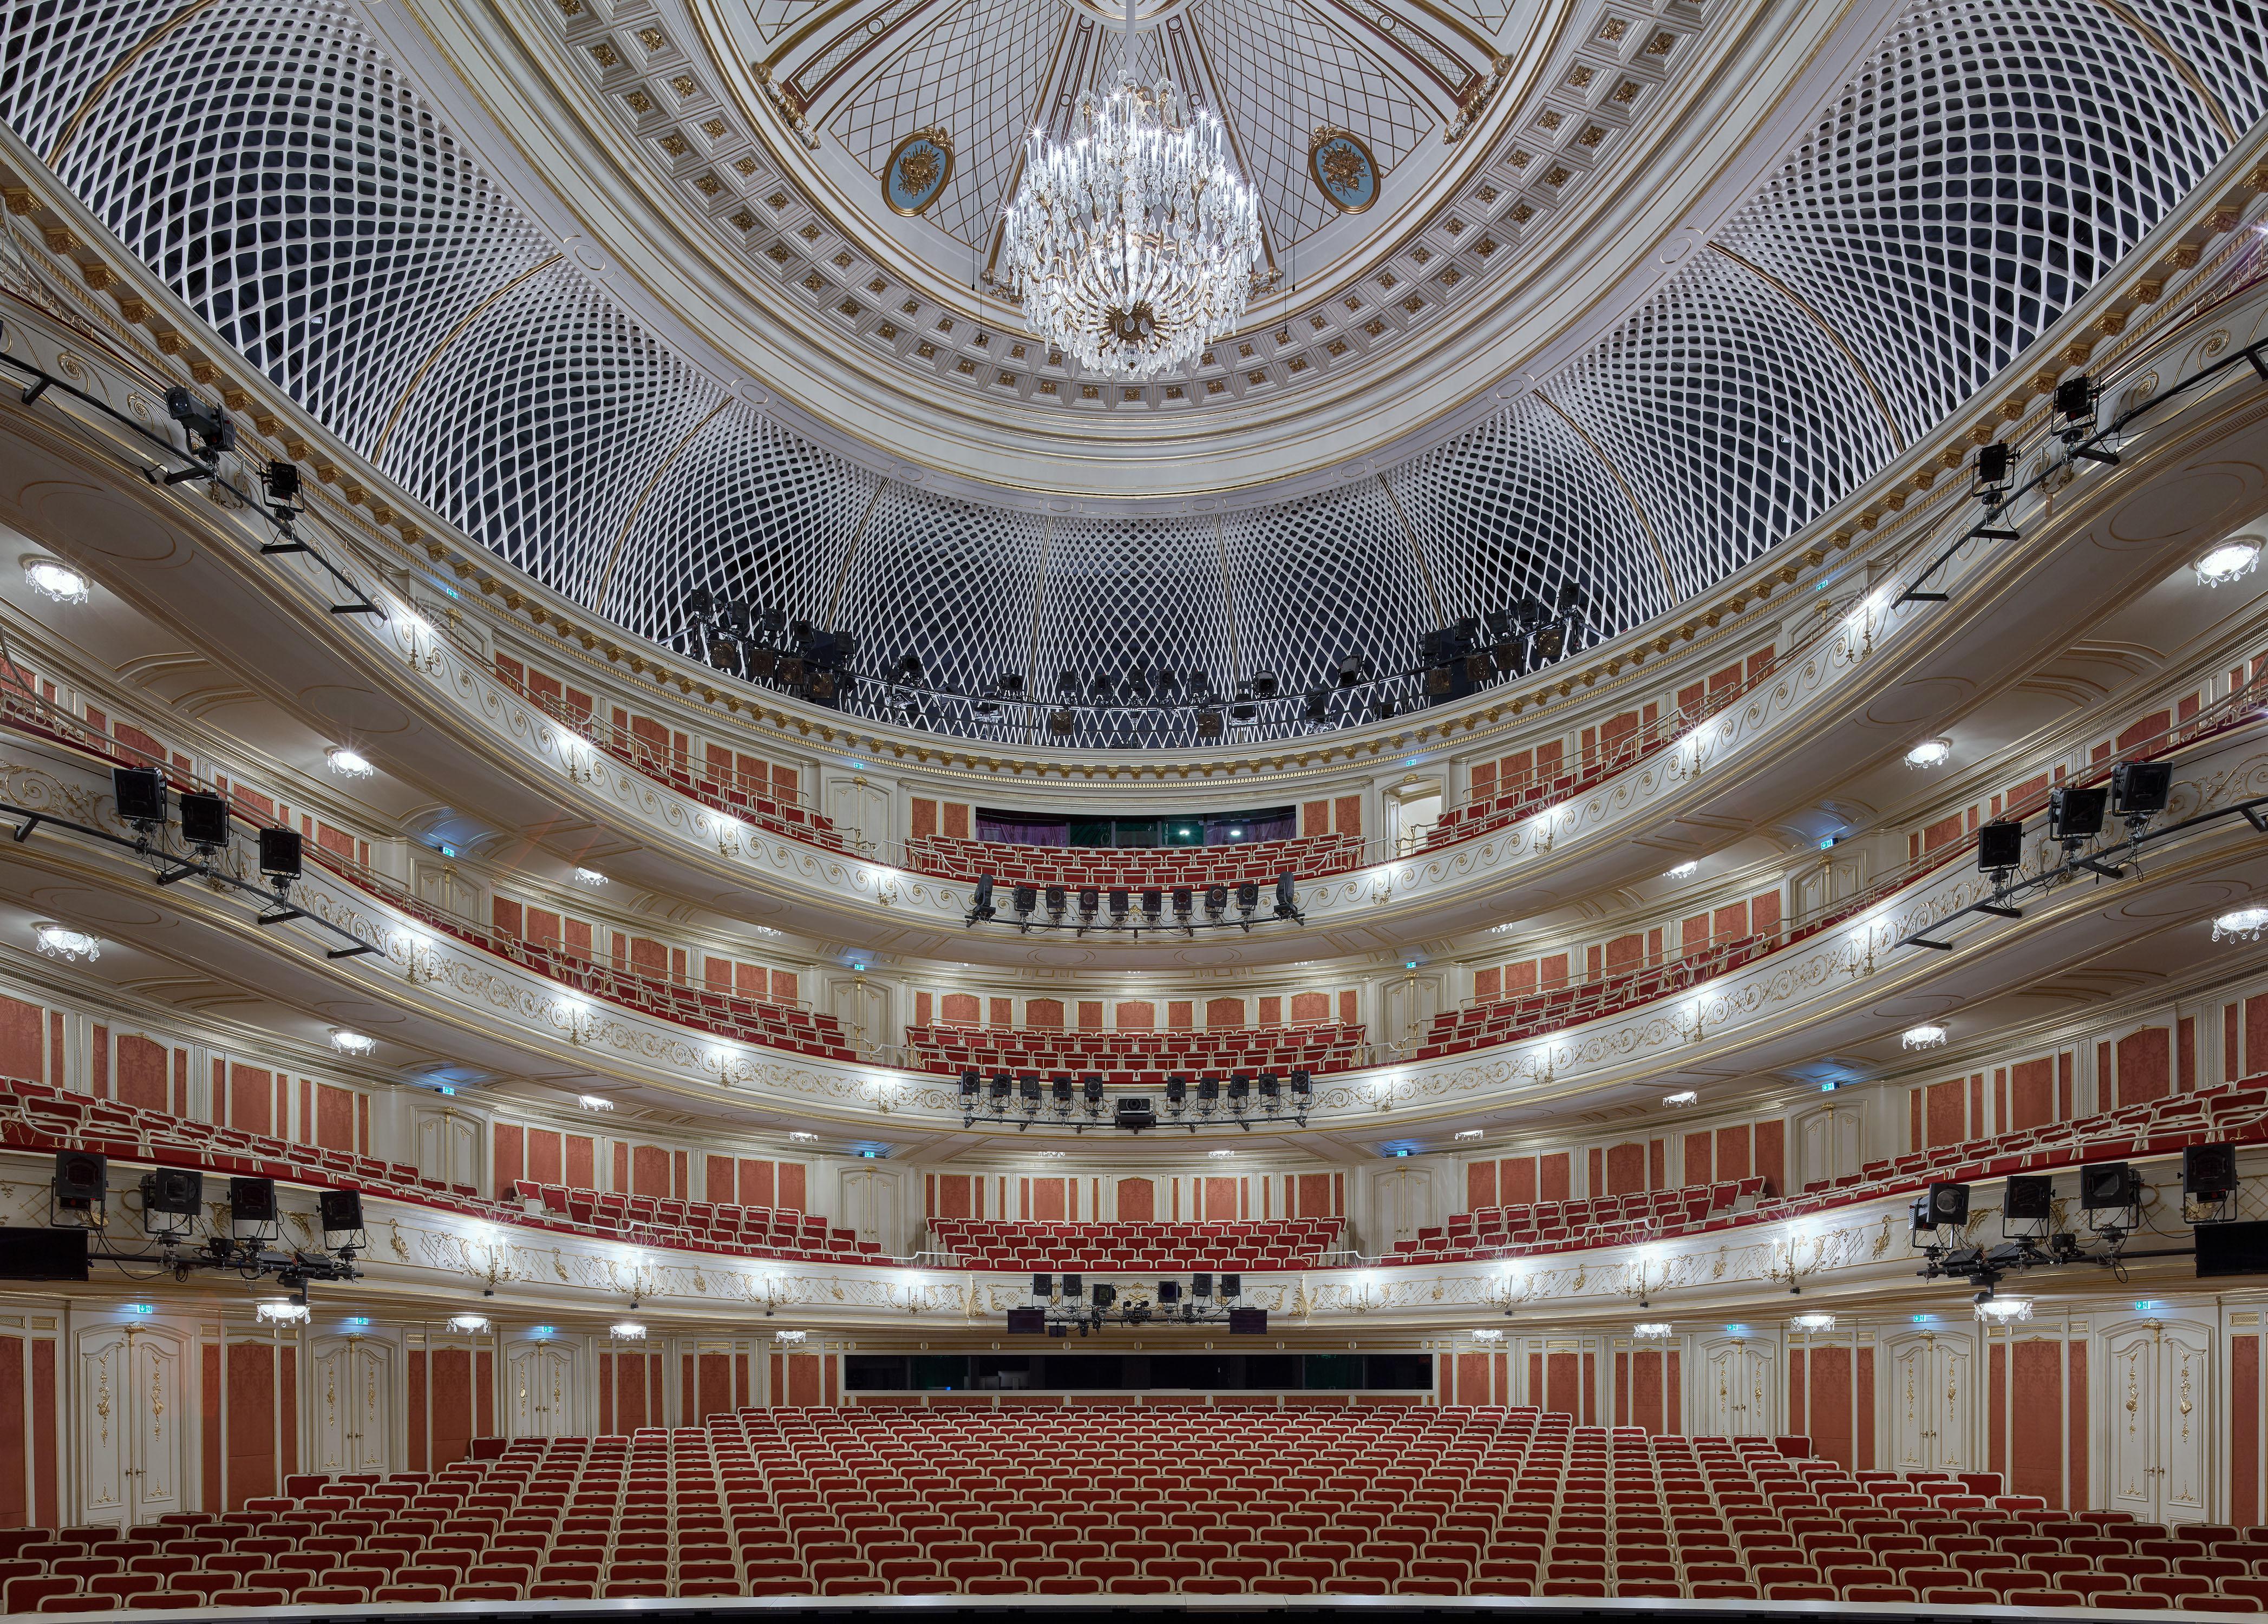 ALPA 画像ギャラリー - ベルリン国立リンデン劇場(Staatsoper unter ...